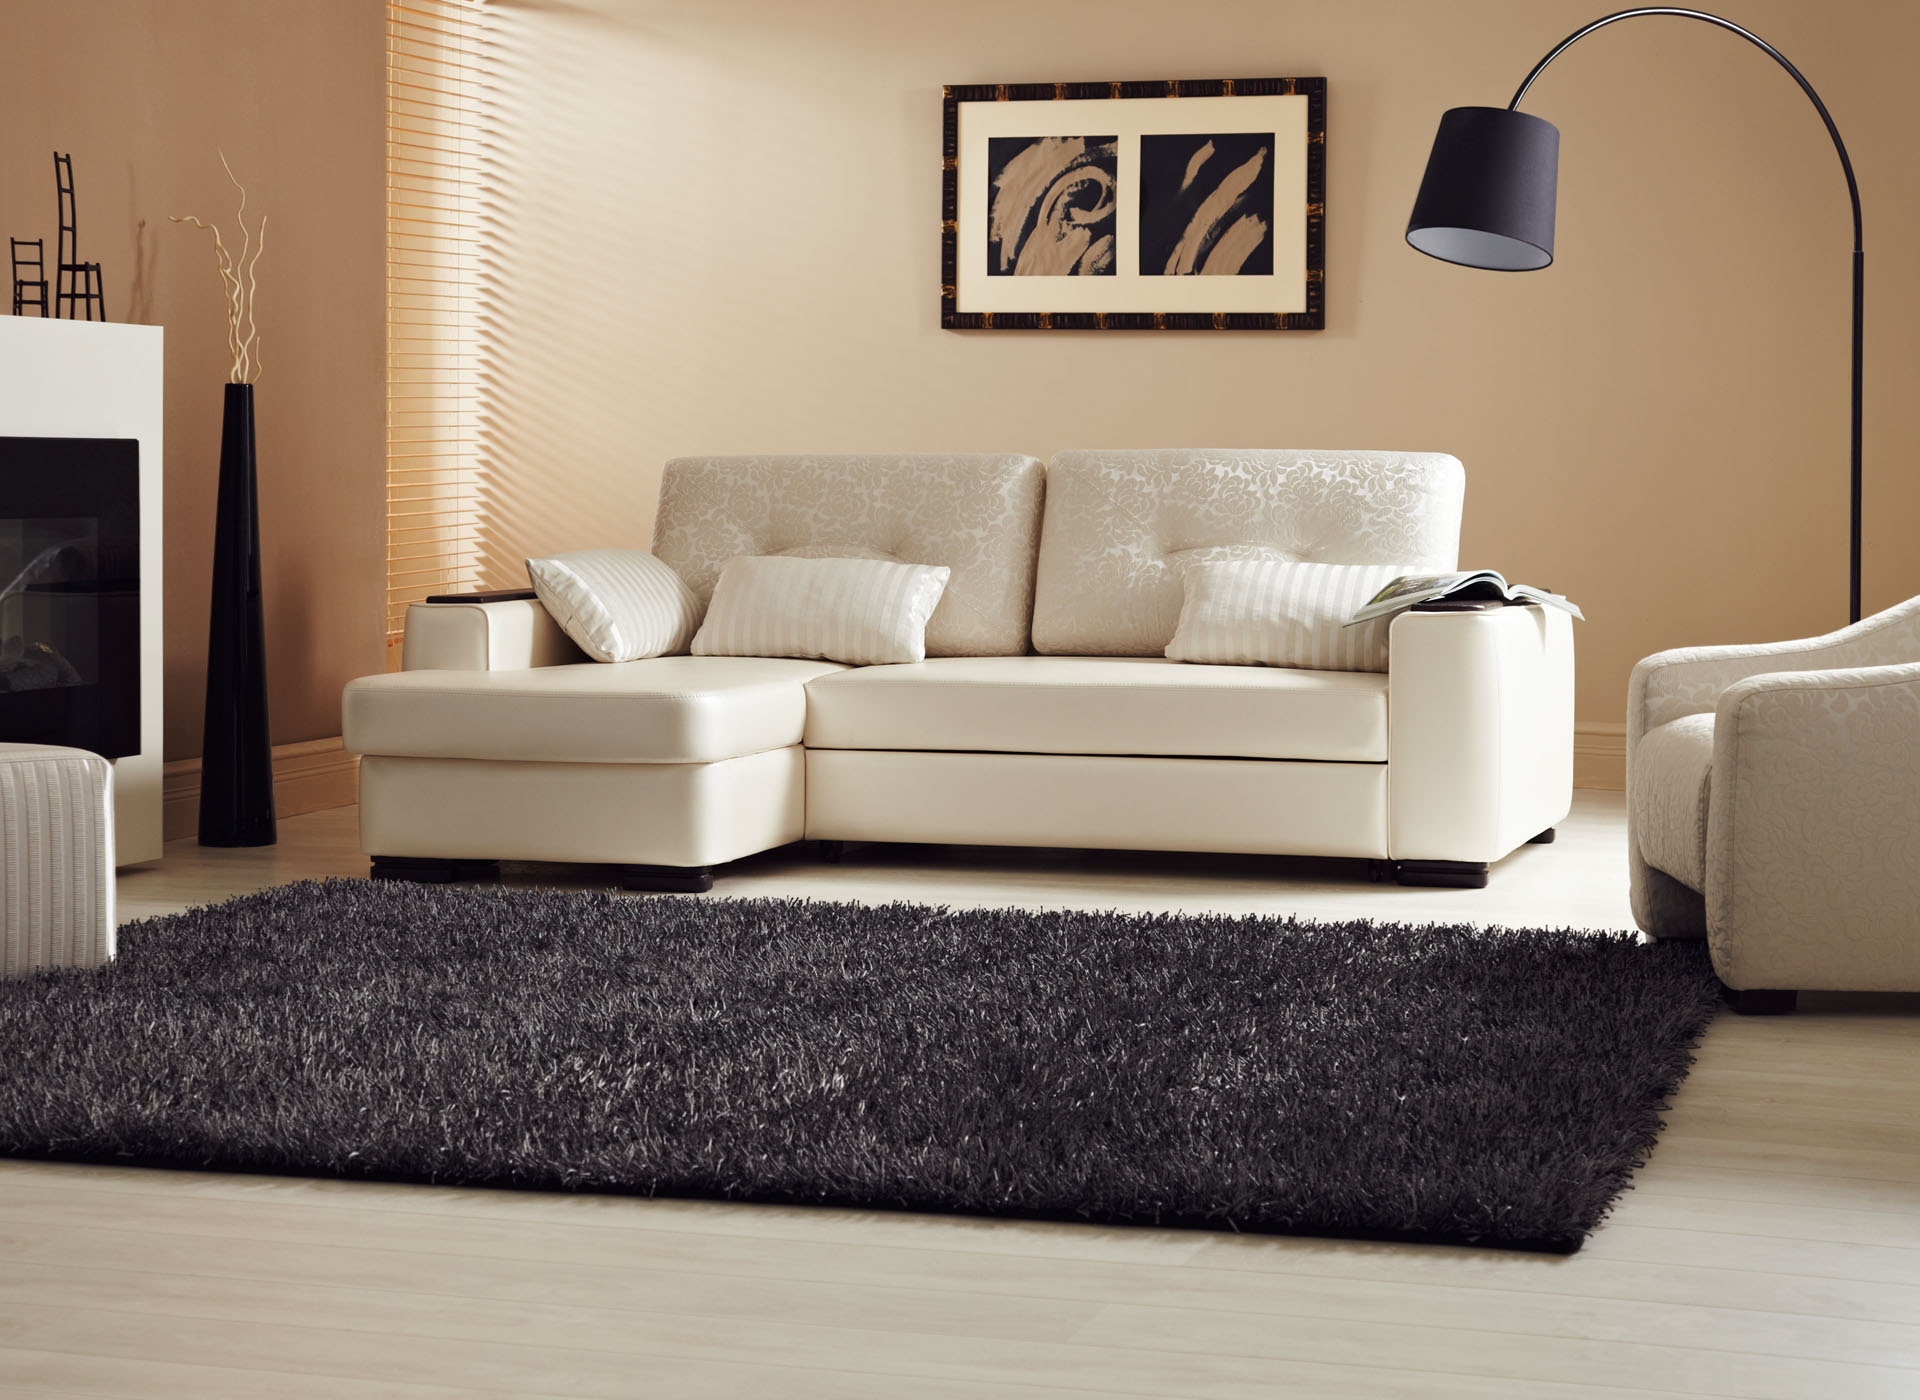 Химчистка мягкой мебели, ковролина